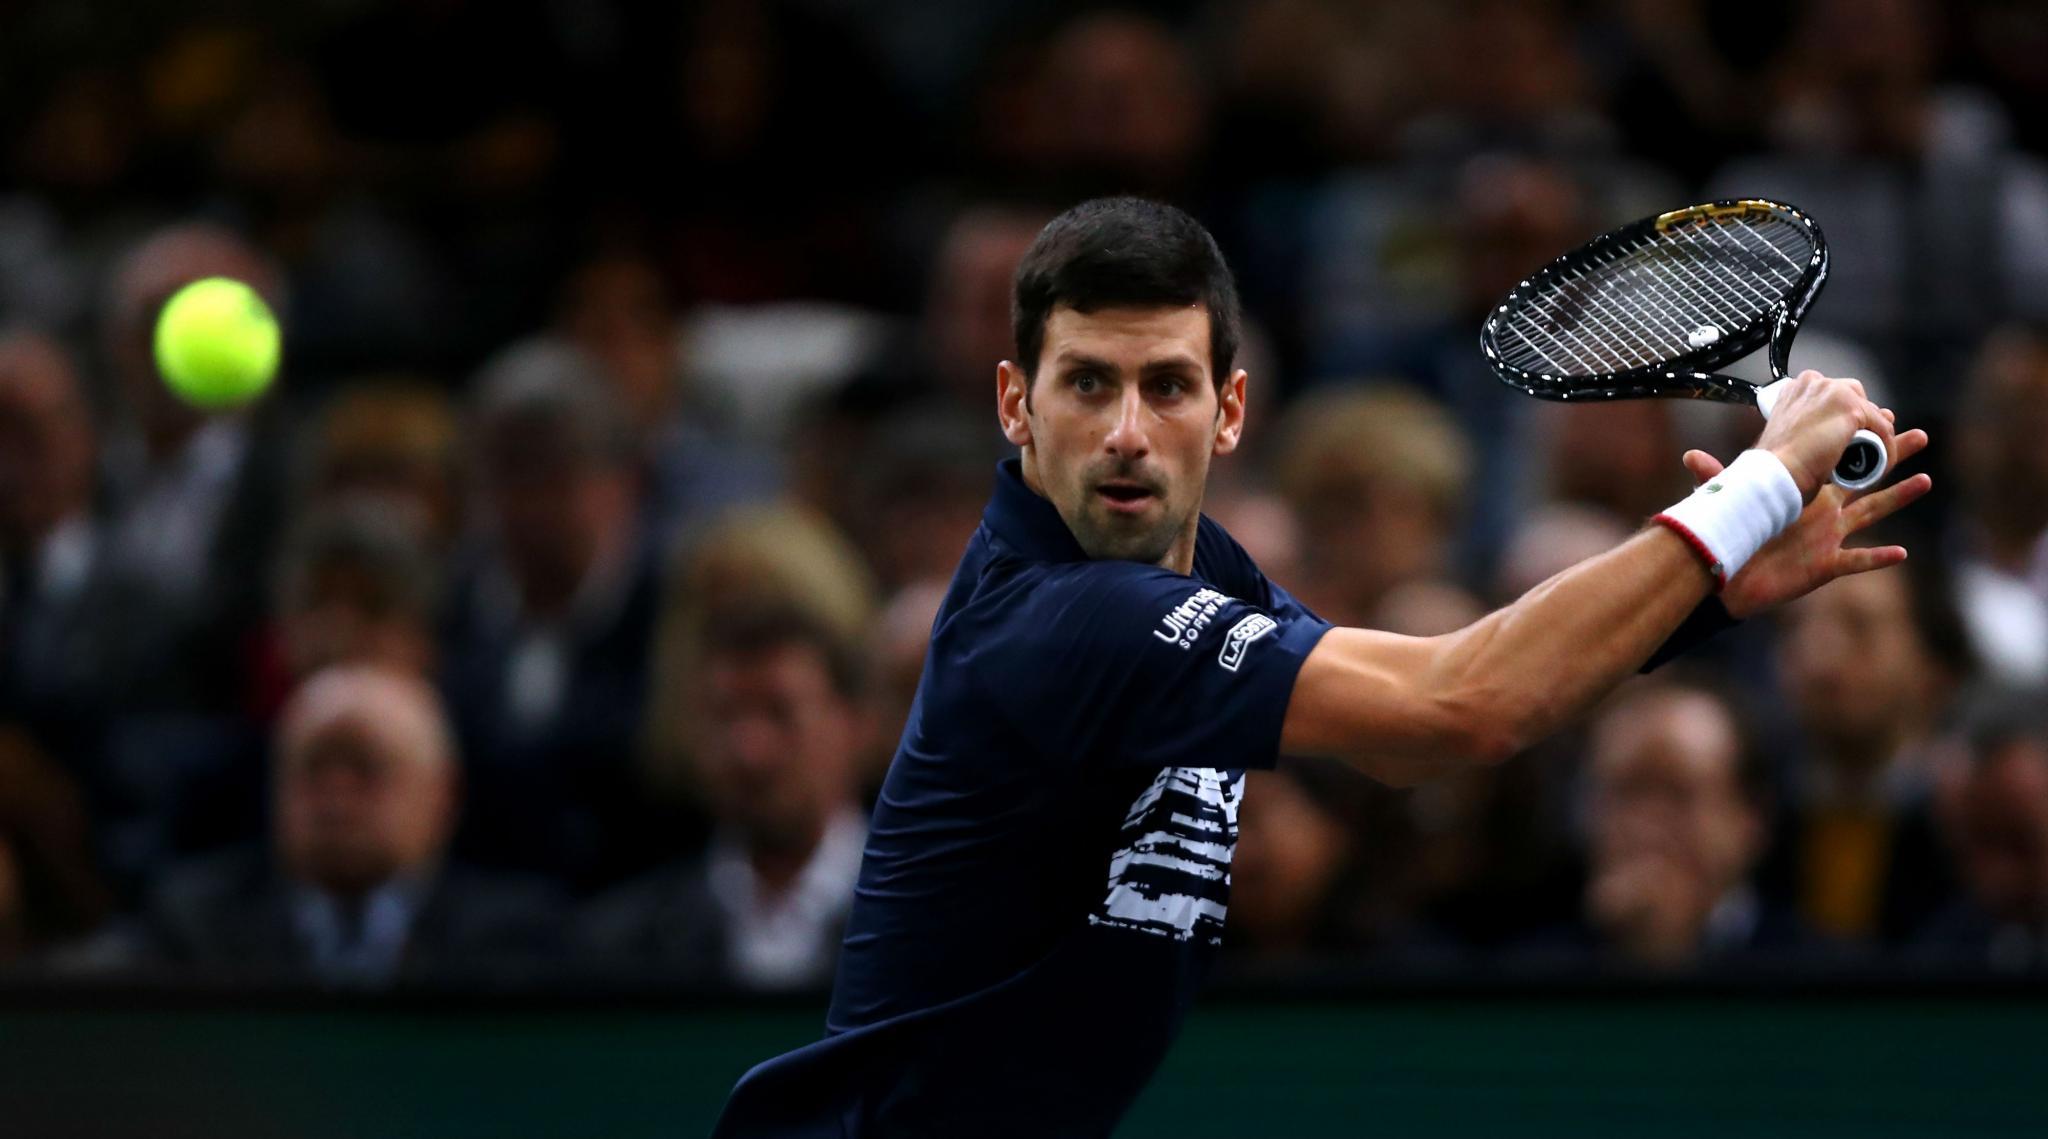 Novak Djokovic vs Milos Raonic, Australian Open 2020 Free Live Streaming Online: How to Watch Live Telecast of Aus Open Men's Singles Quarter-Final Tennis Match?